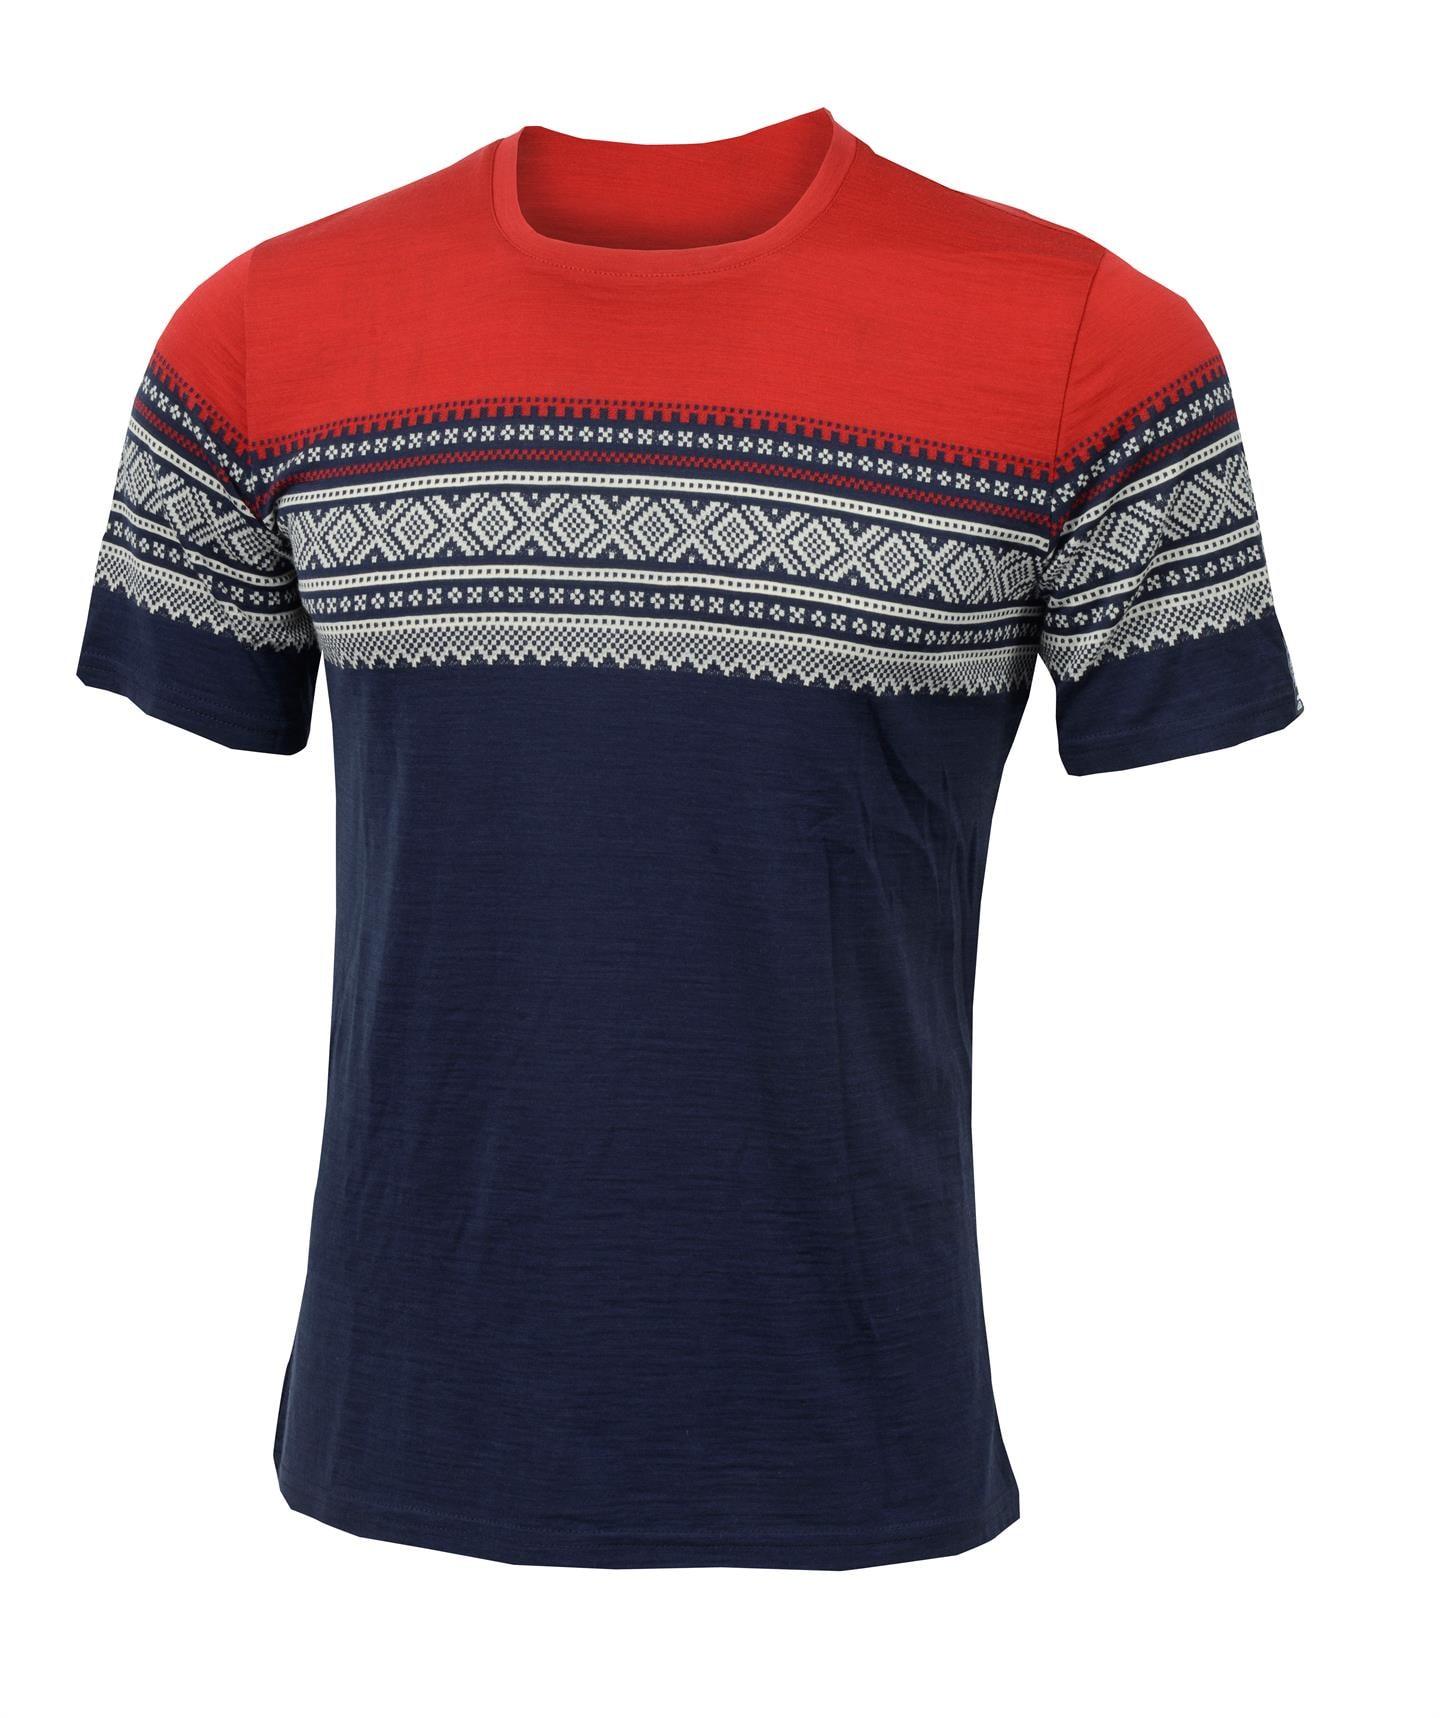 Aclima De Marius T-shirt, M's